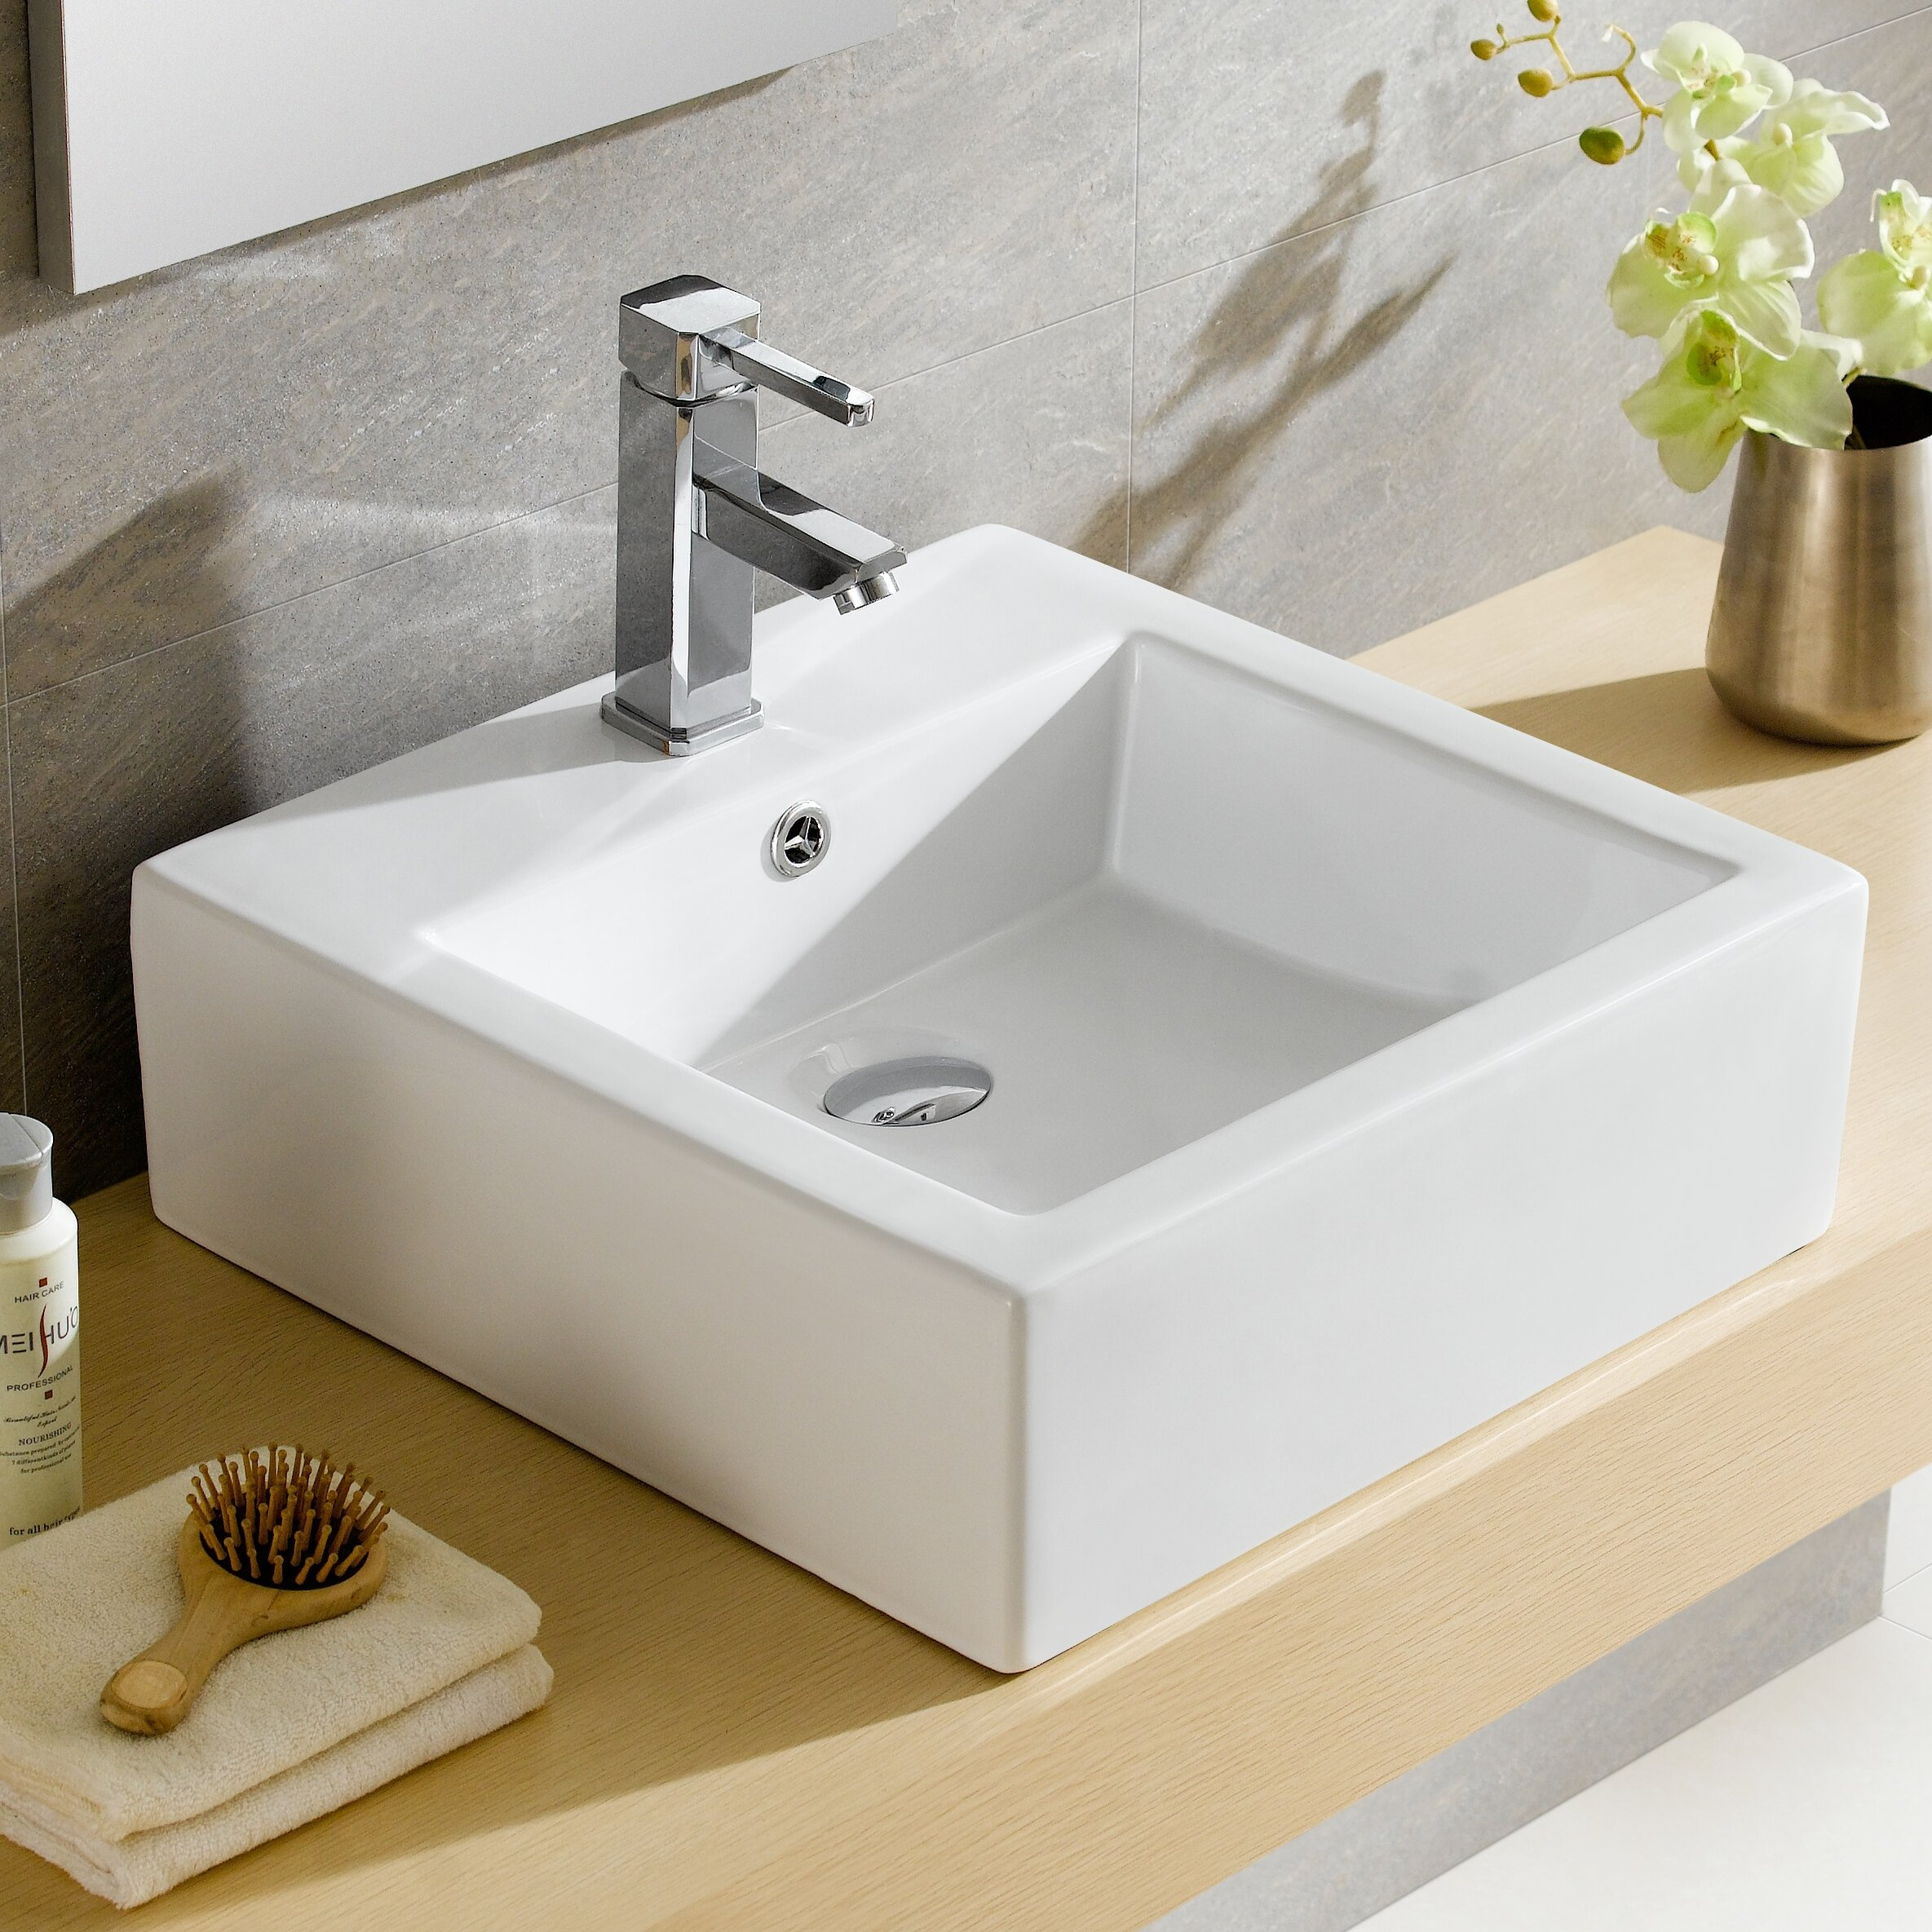 Fine Fixtures Modern Ceramic Square Vessel Bathroom Sink With Overflow Reviews Wayfair